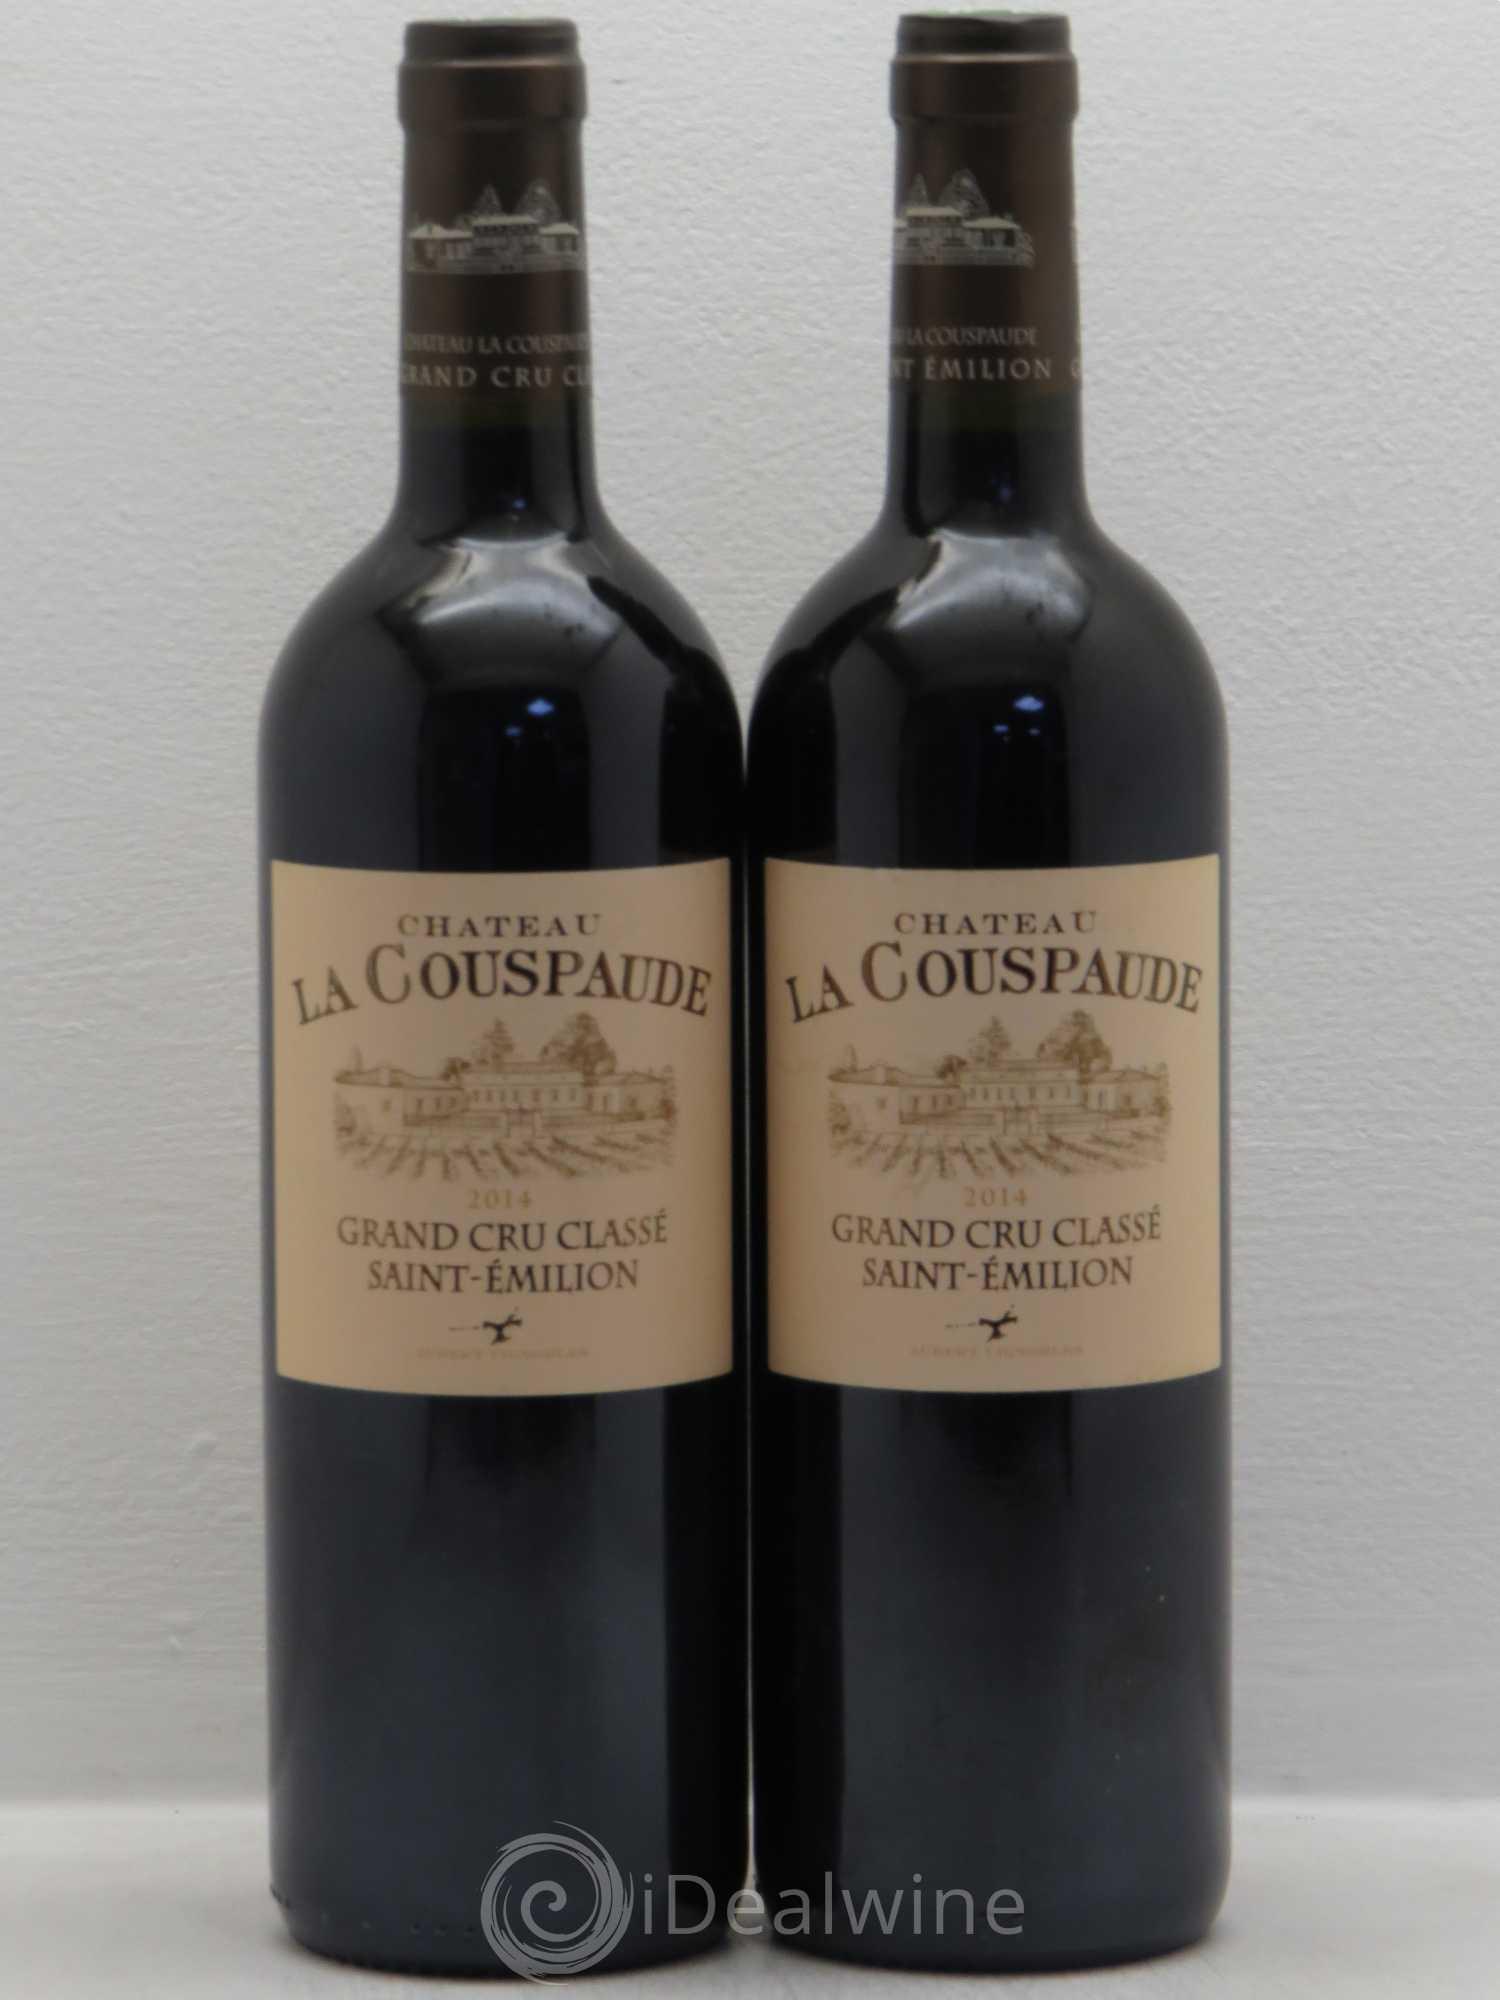 Acheter Château la Couspaude Grand Cru Classé 2014 (lot: 7518)